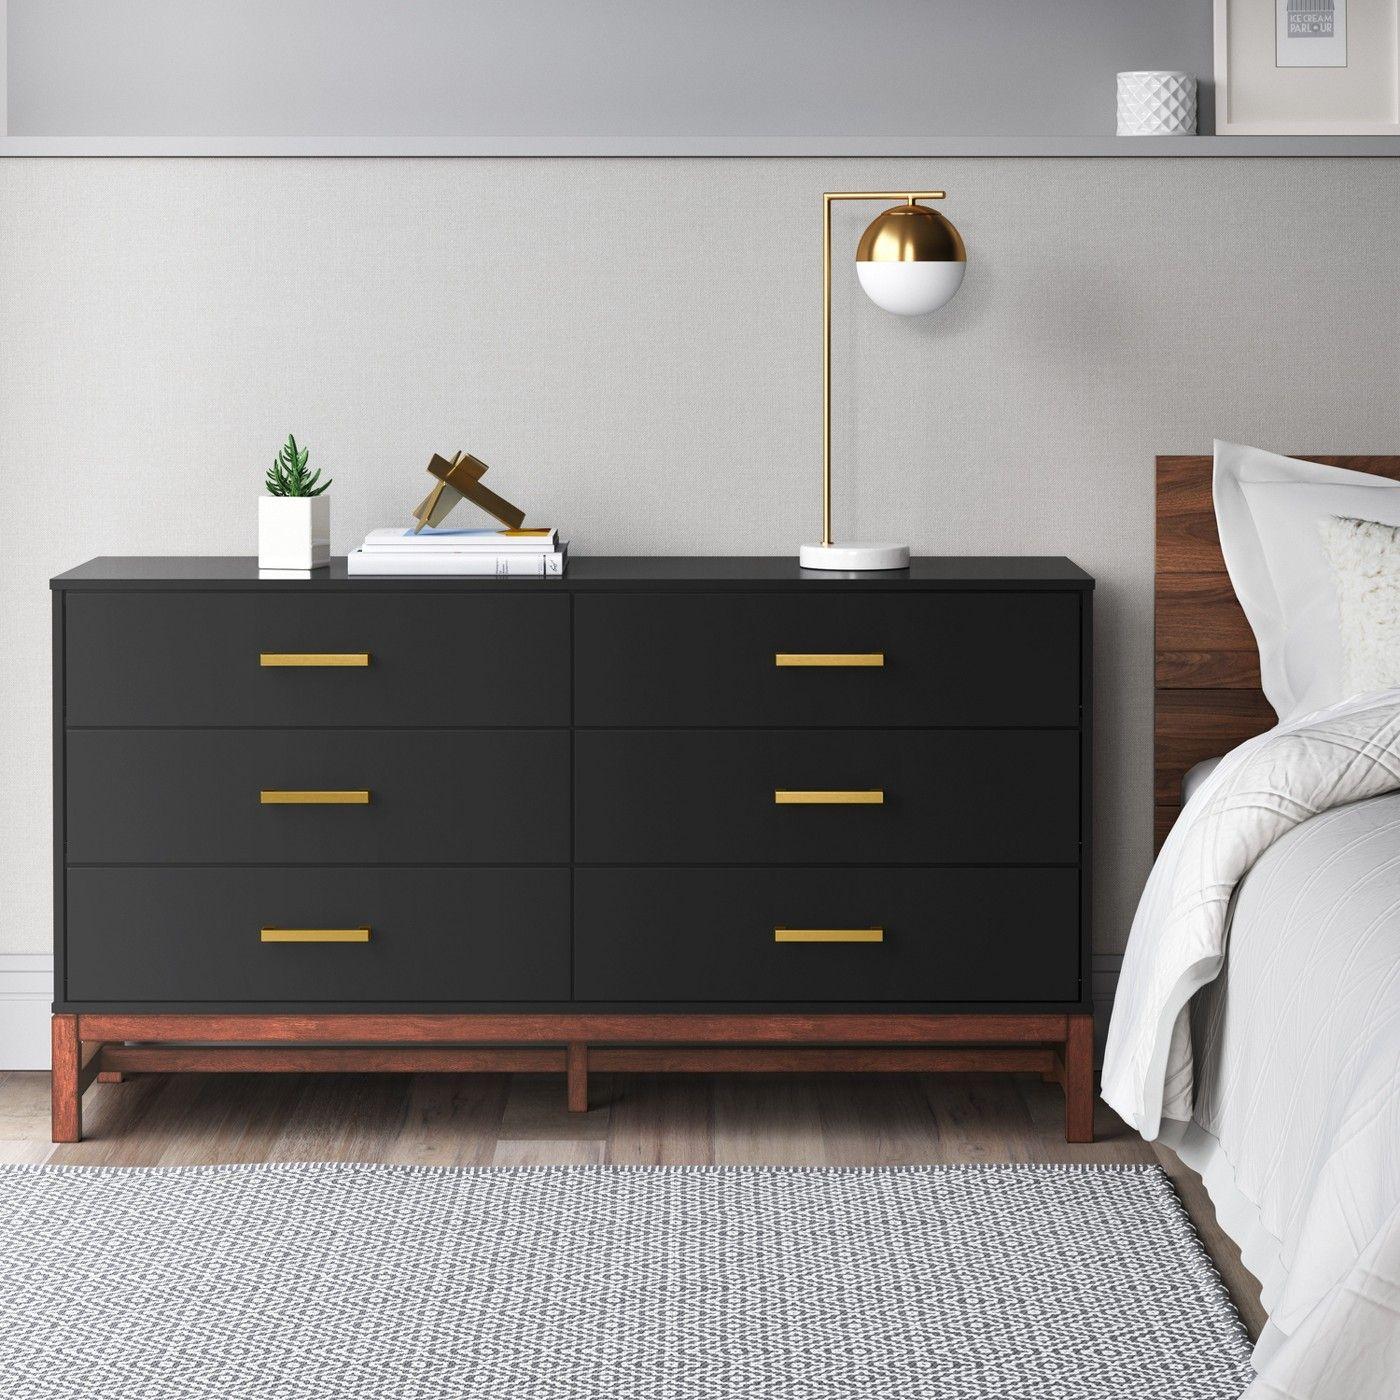 Https Www Target Com P Guthrie Two Tone 6 Drawer Dresser Project 62 153 A 51647074 Ikea Dresser Makeover Dresser Decor Dresser Drawers [ 1400 x 1400 Pixel ]